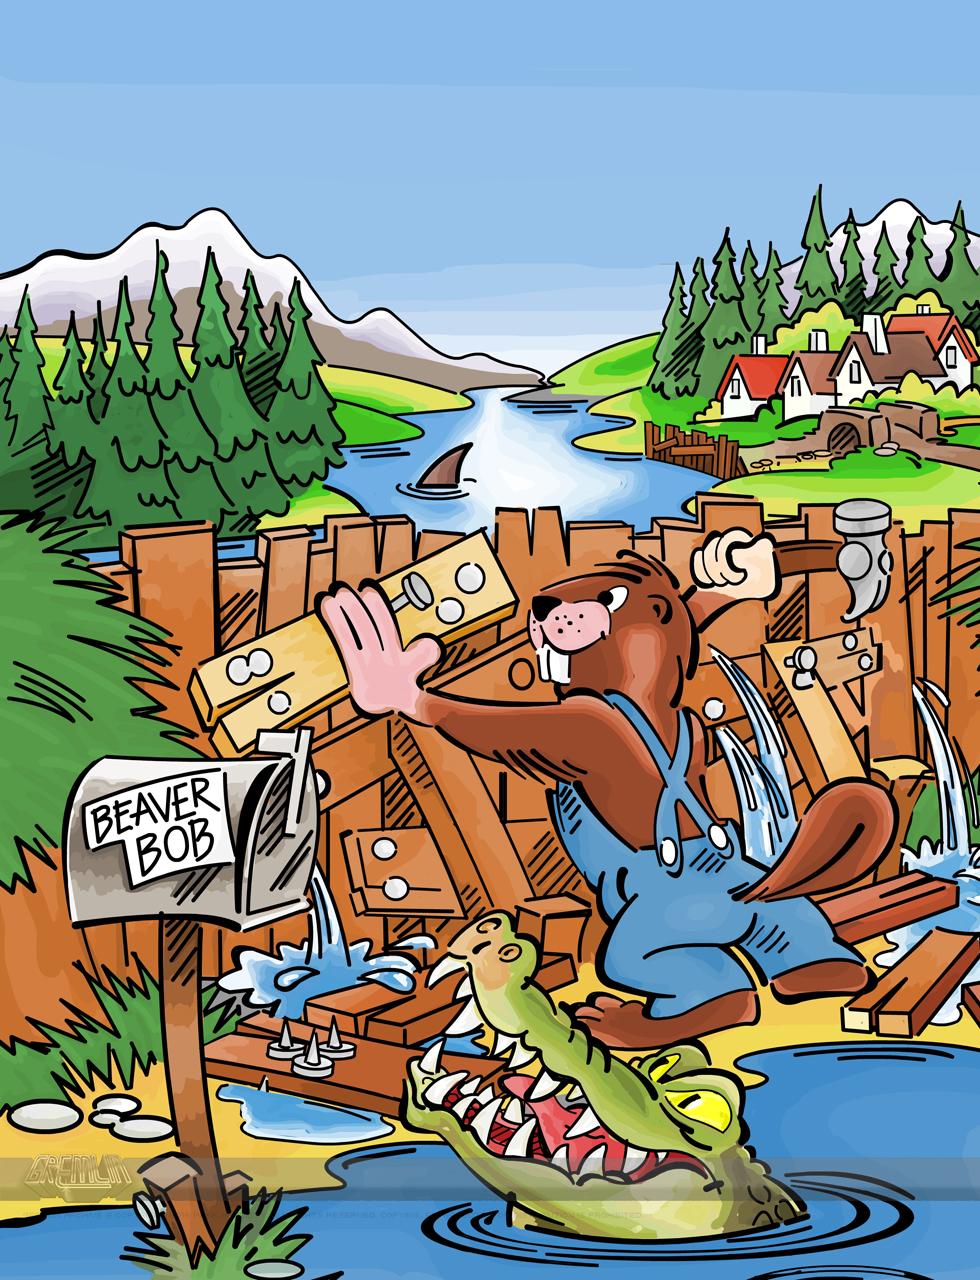 Beaver Bob in Dam Trouble